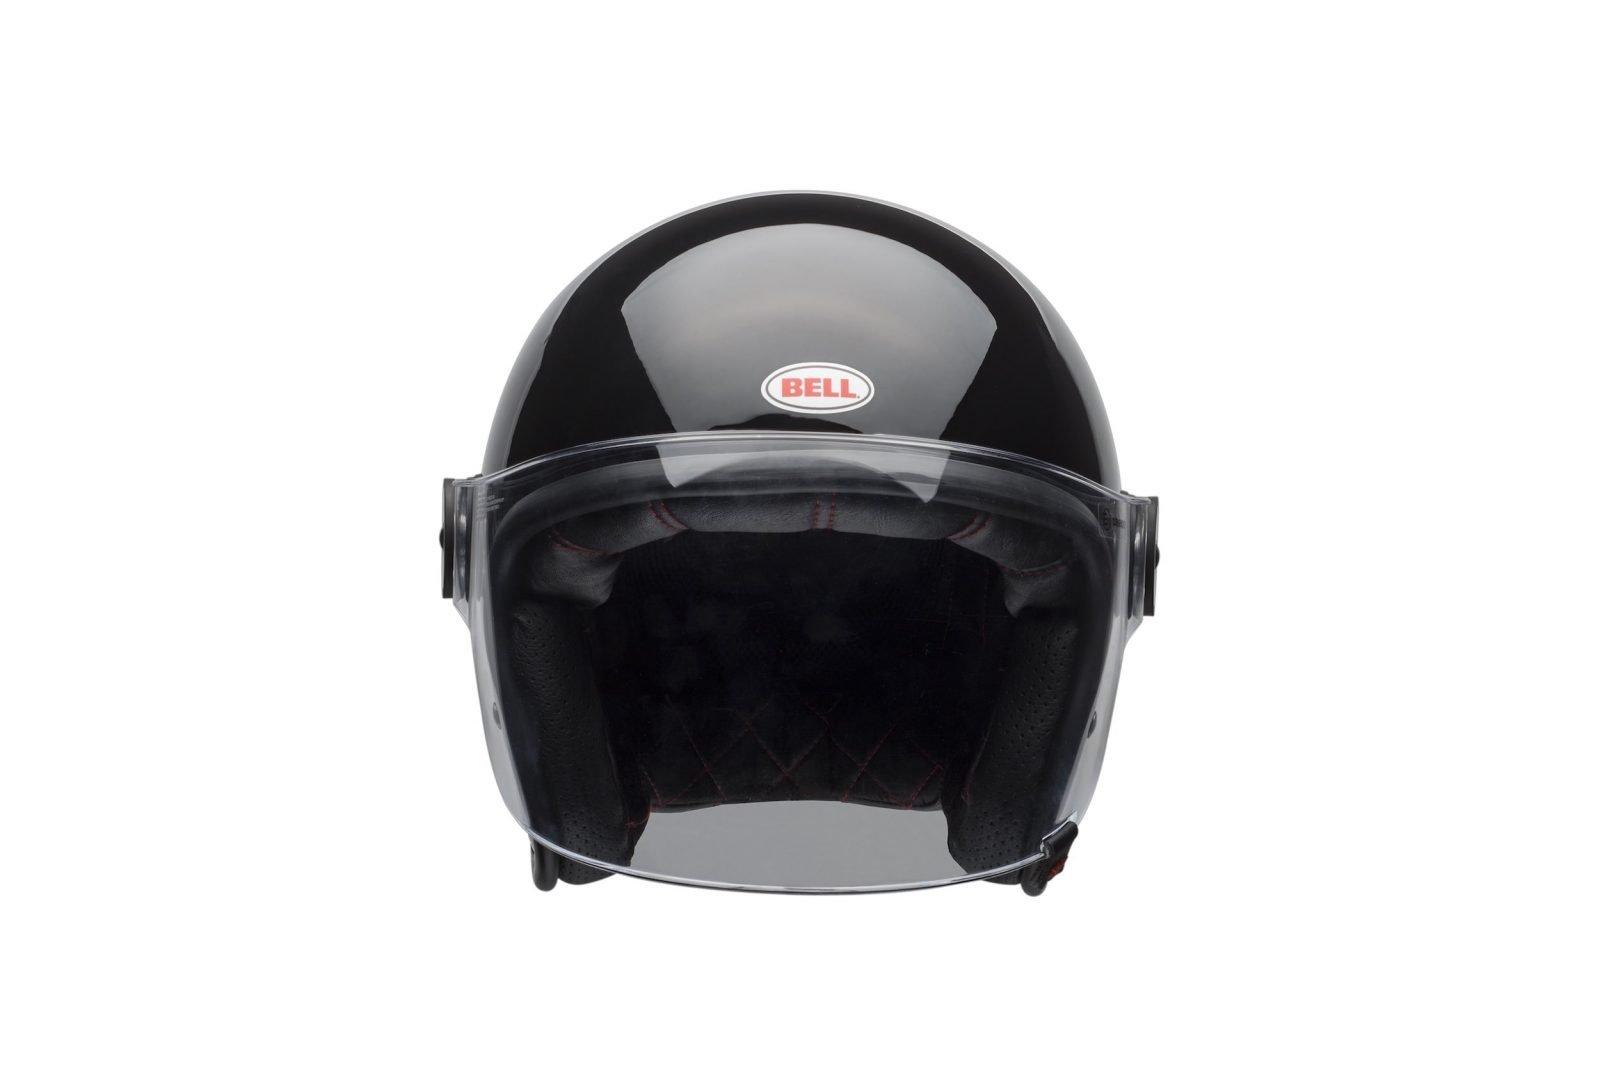 Bell Riot Helmet 2 1600x1068